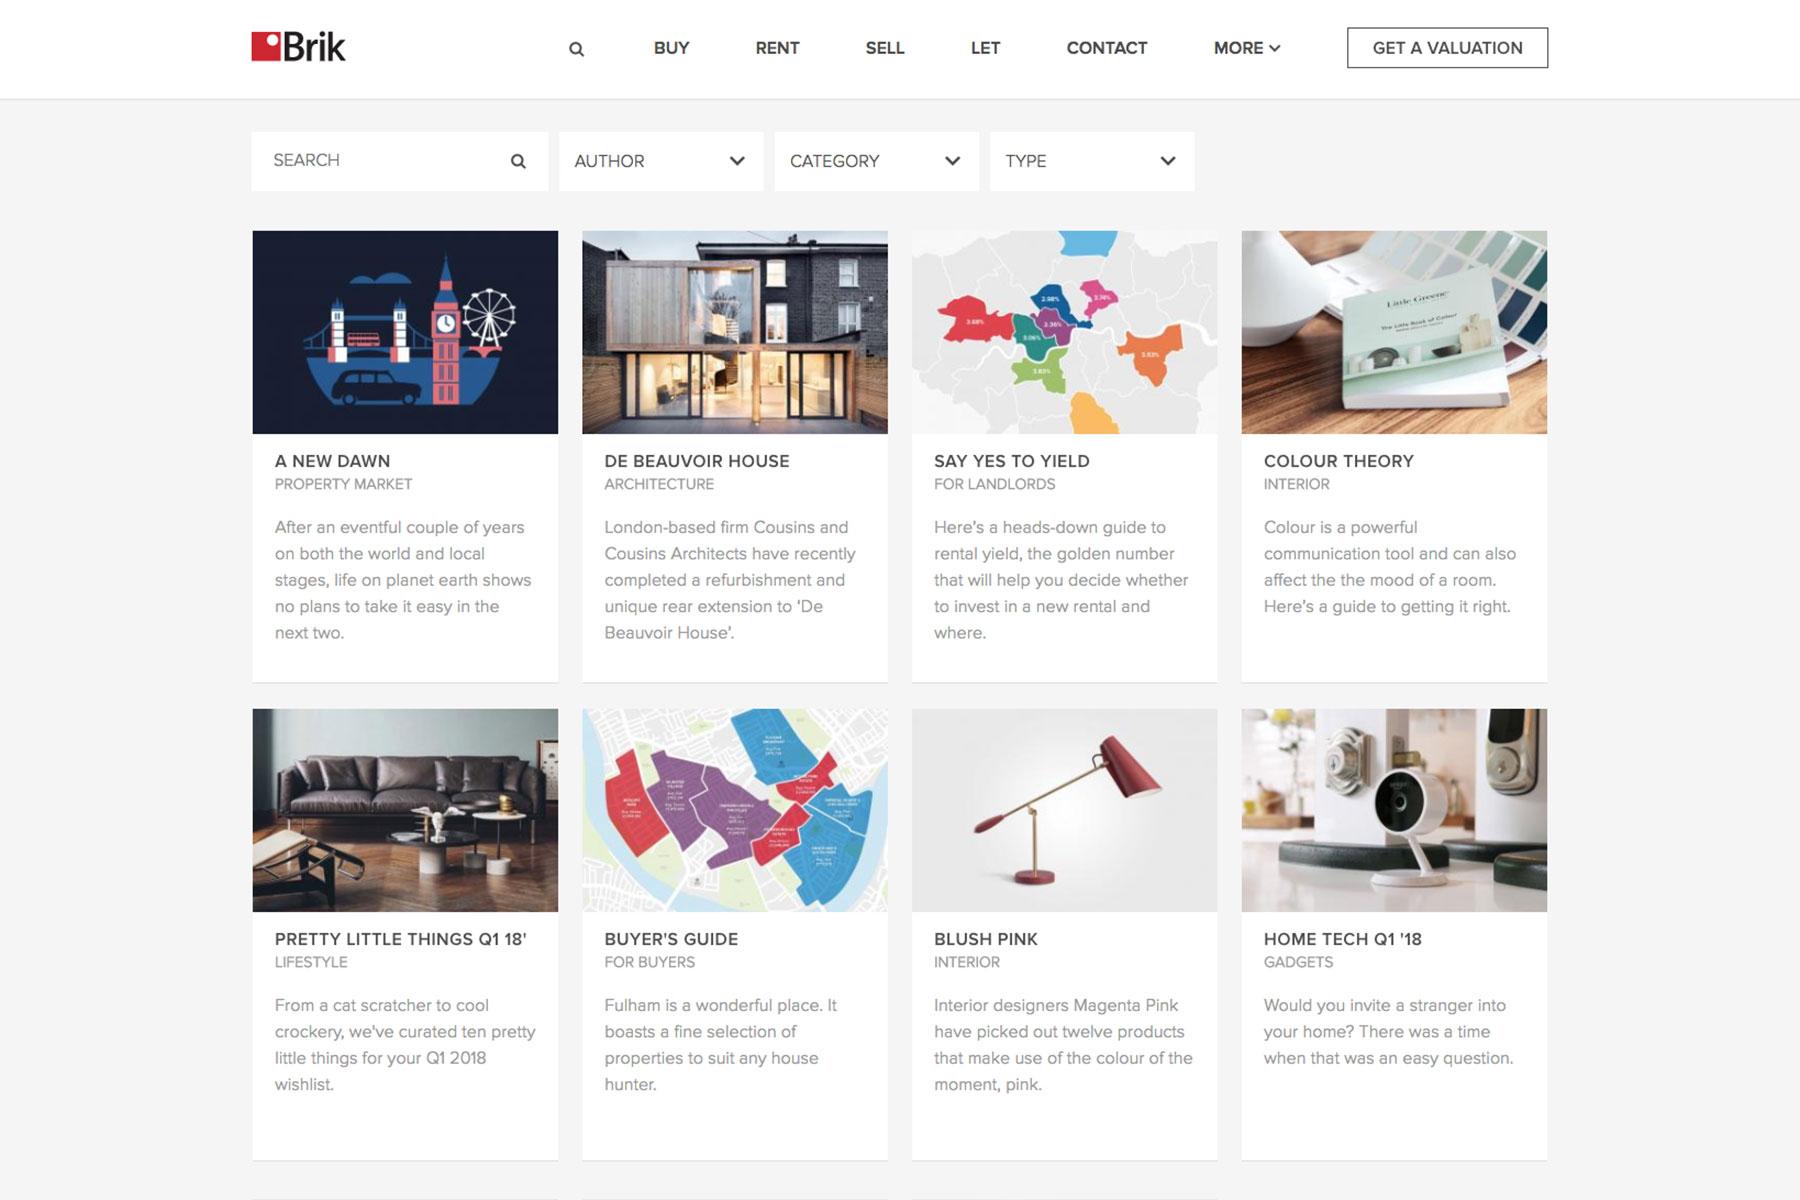 lifestyle-architecture-interior-design-blog